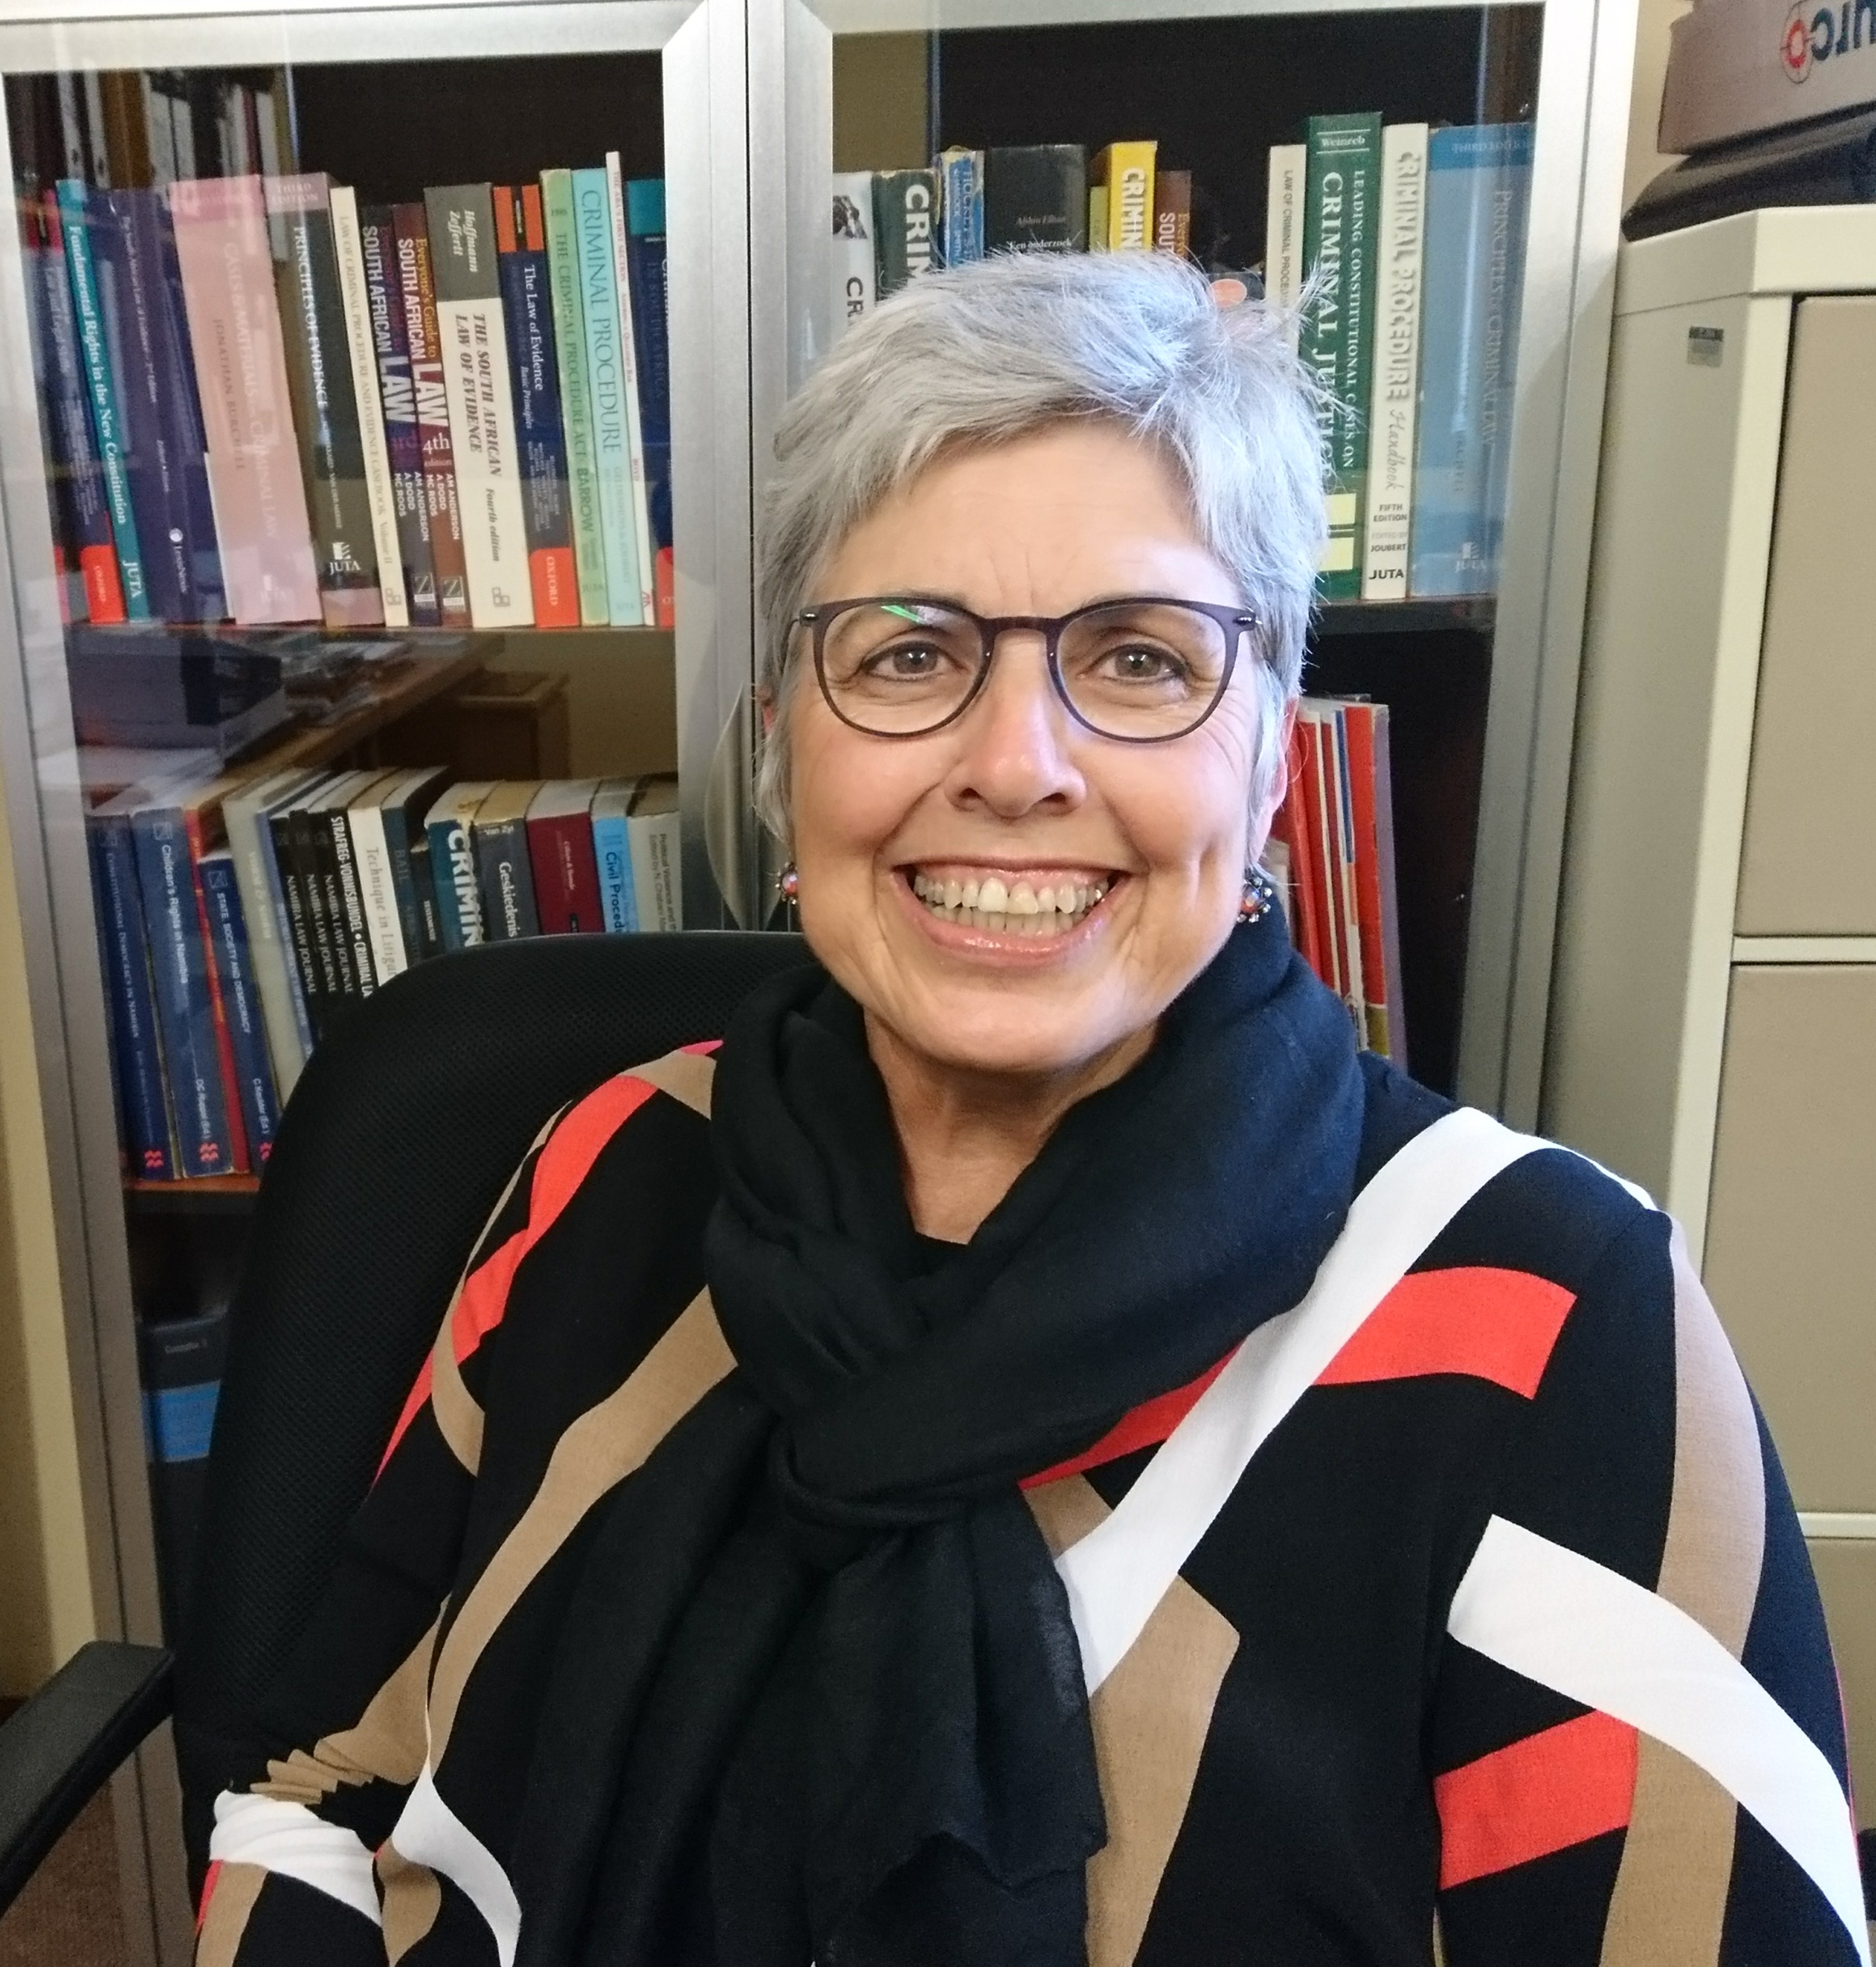 Annette van der Merwe